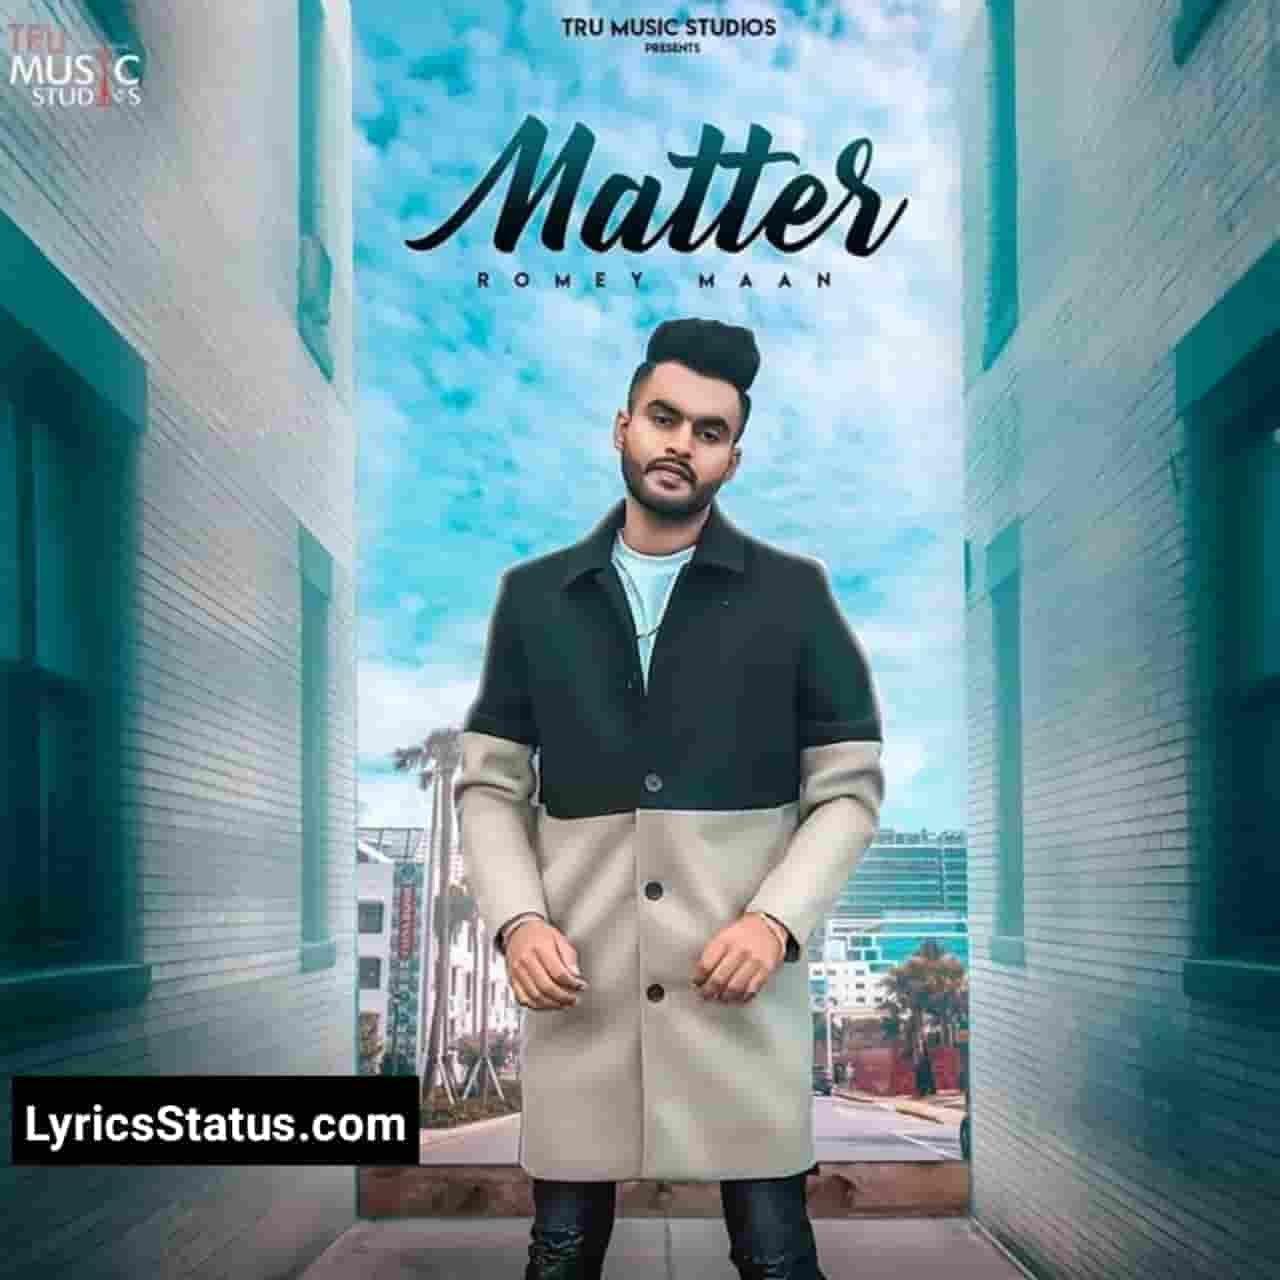 Romey Maan New Song Matter Lyrics Status Download Video Latest punjabi song Jatt Layi Matter Tu Kardi Na Kardiyaa Cara Cura Nipunjabi song